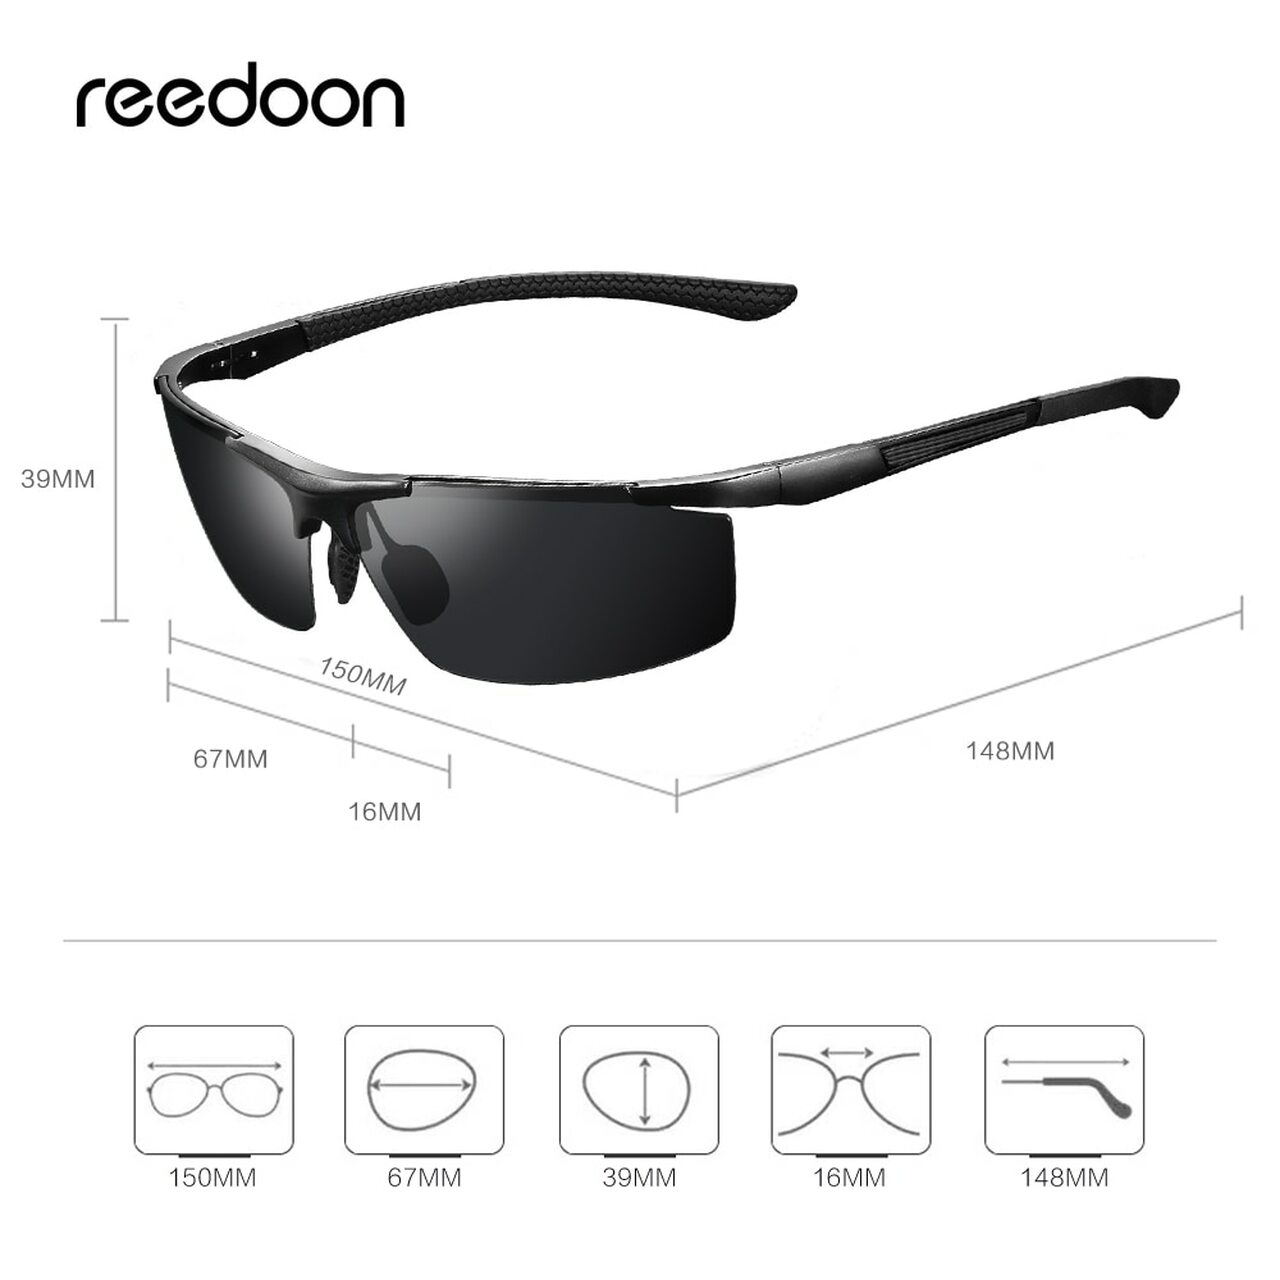 f279170896bc3 ... Reedoon Polarized Sunglasses HD Lens UV400 Metal Frame Male Sun Glasses  Brand Designer Driving Goggles For ...